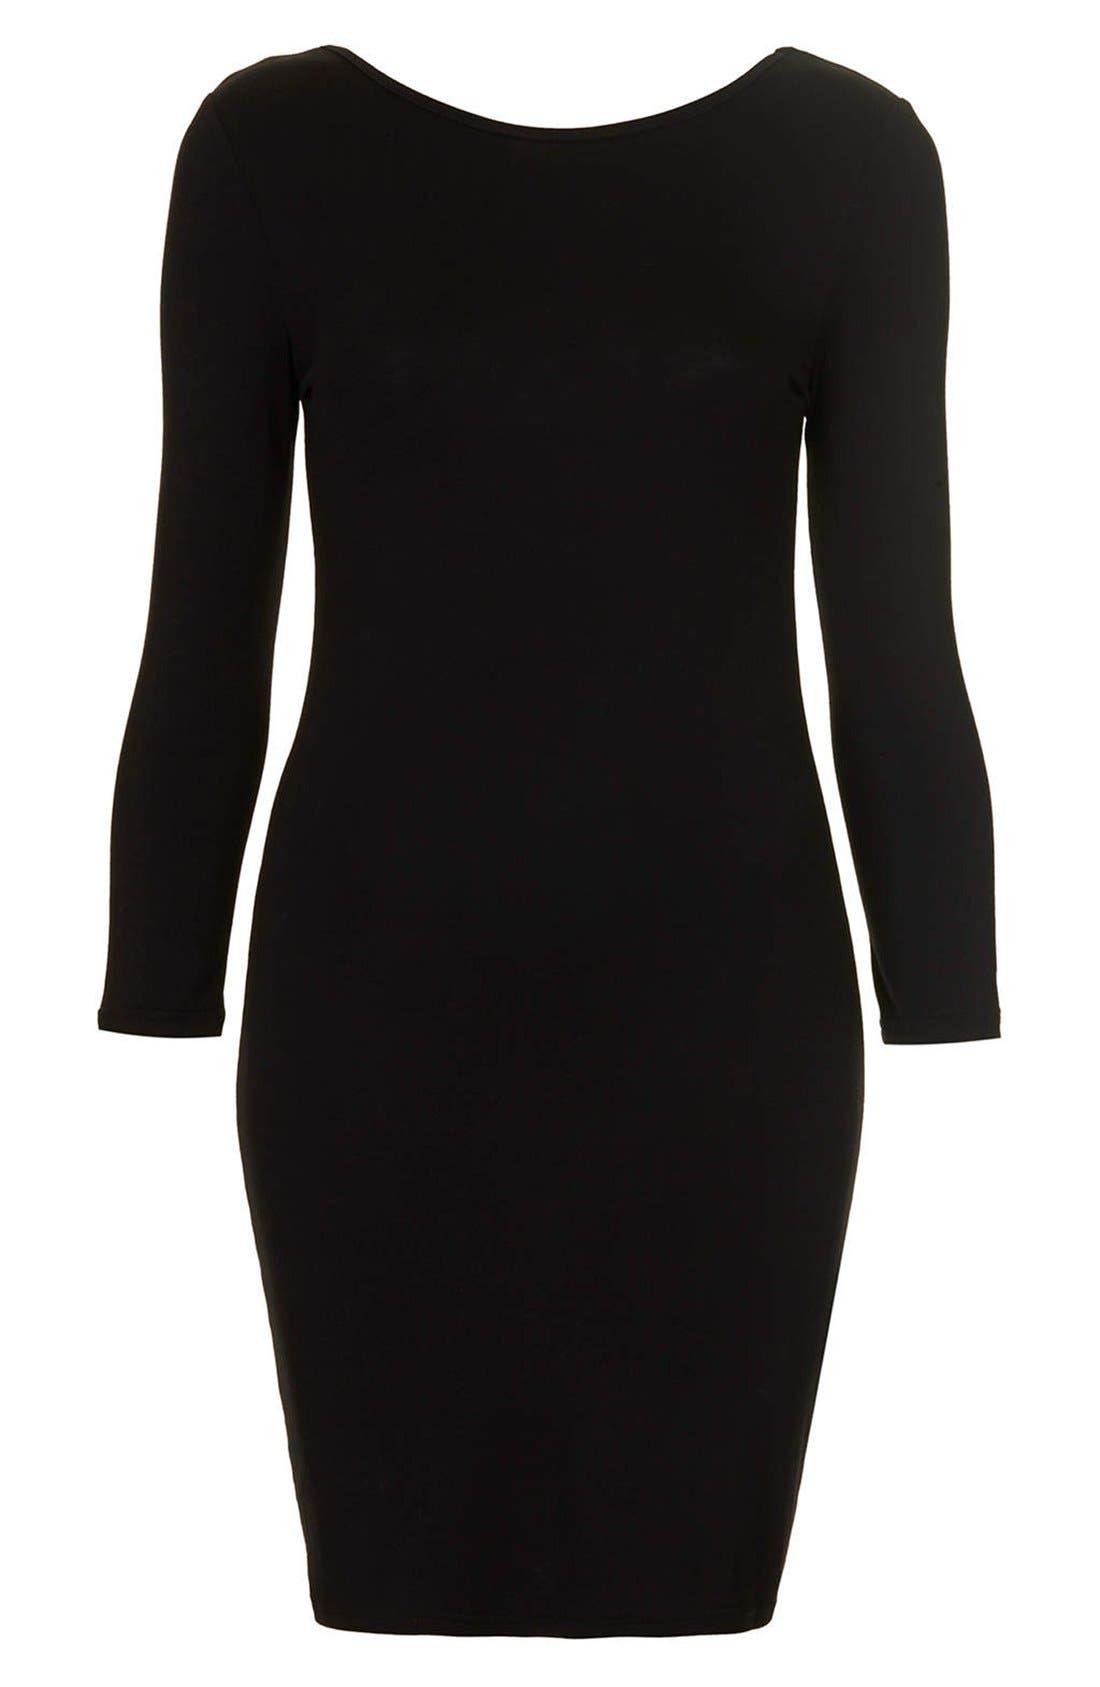 Alternate Image 3  - Topshop Scoop Back Jersey Body-Con Dress